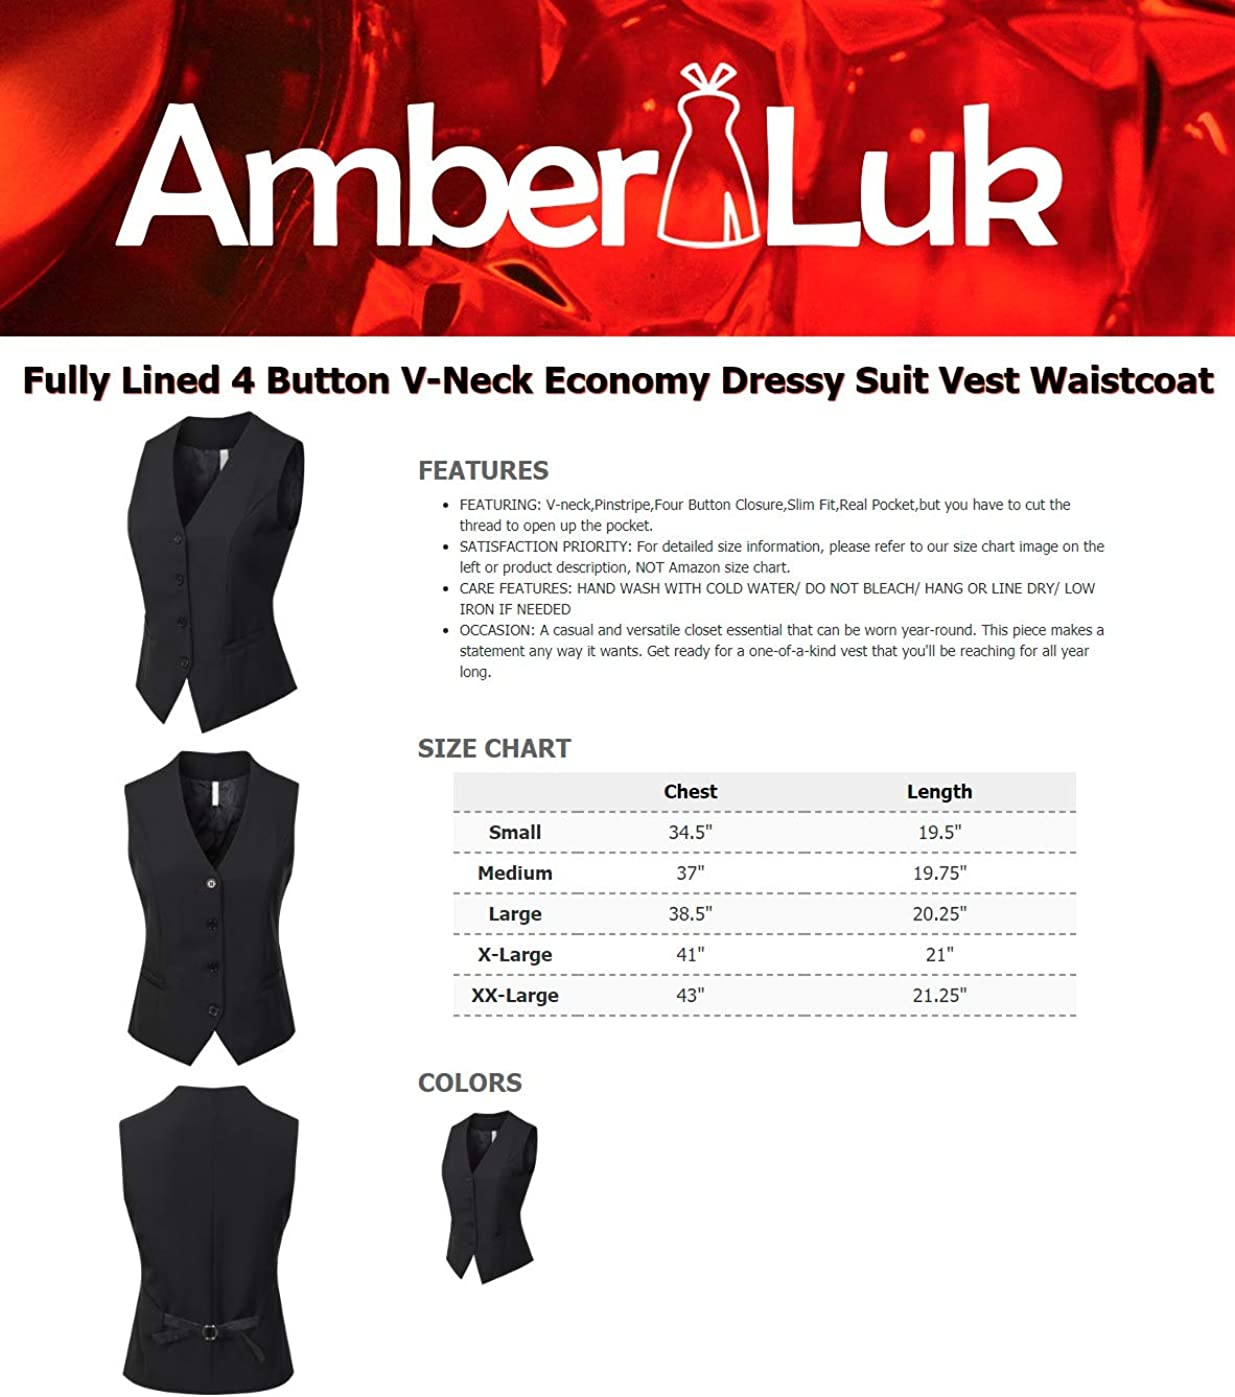 AmberLuk Womens Fully Lined 4 Button V-Neck Economy Dressy Suit Vest Waistcoat Black M